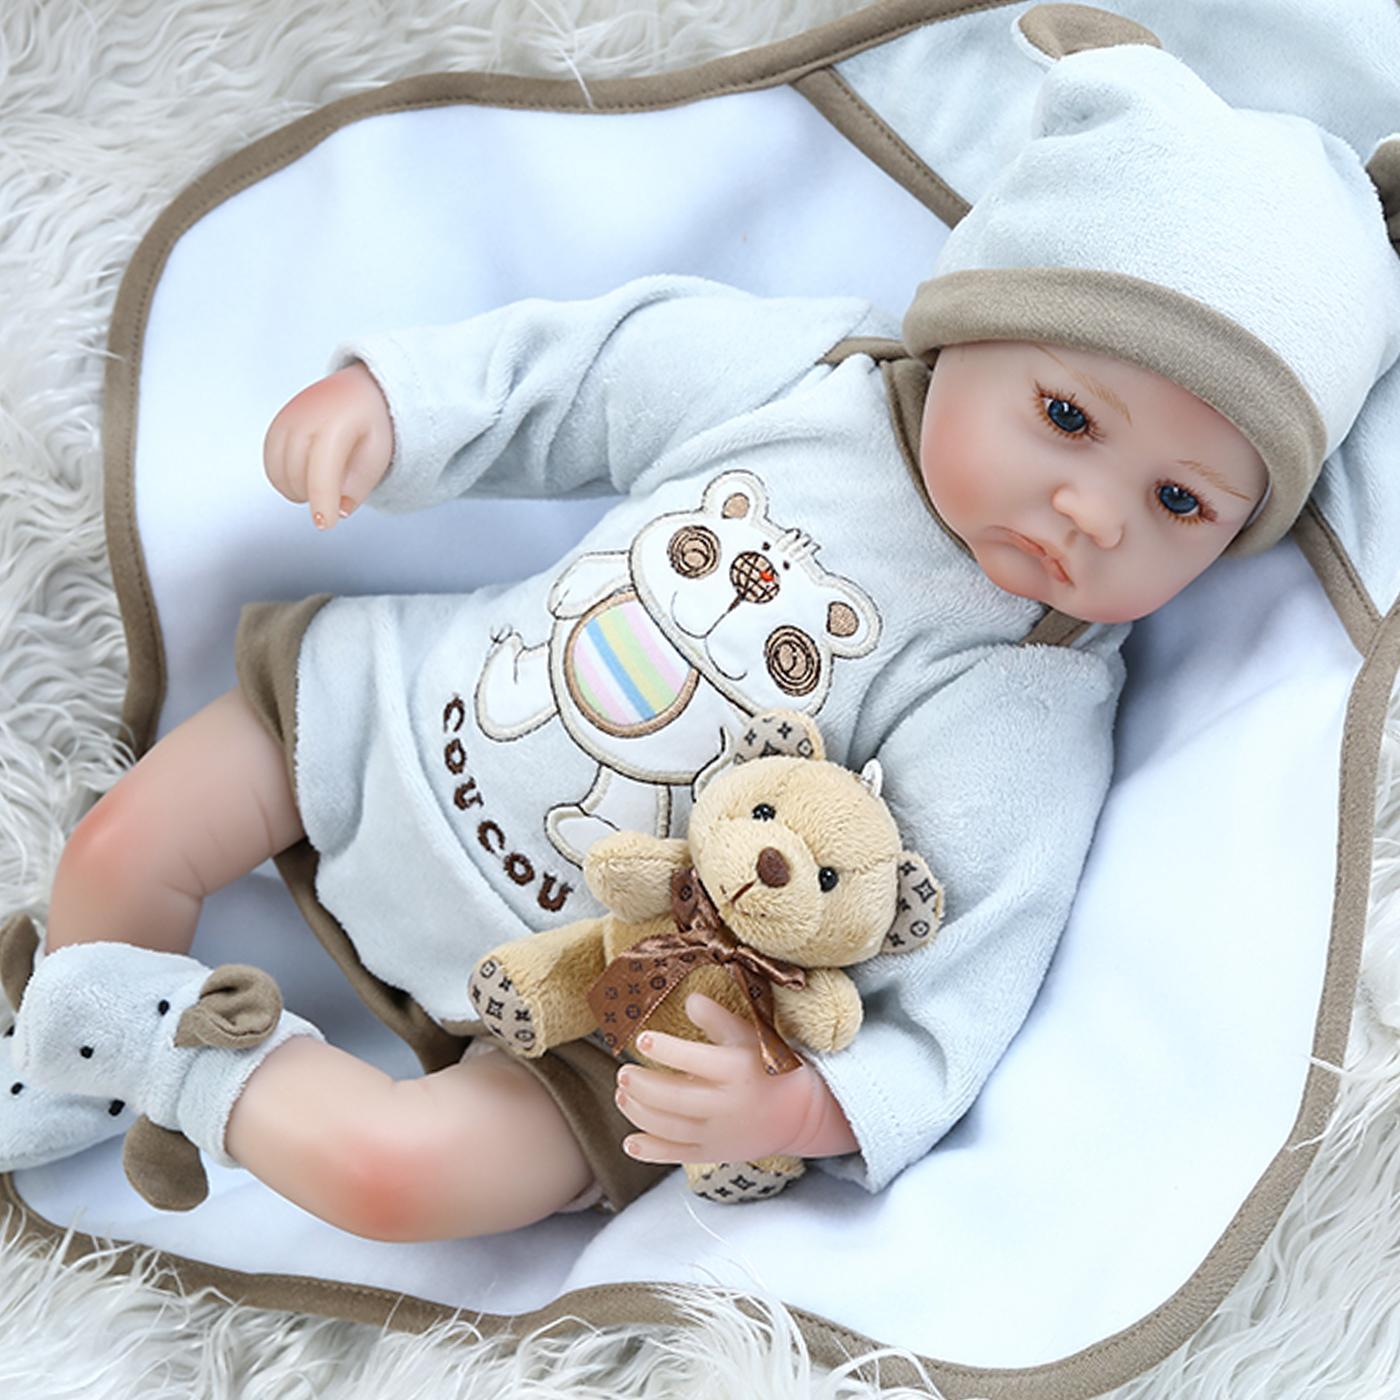 wholesale-npk-40cm-reborn-baby-premie-doll-lifelike-5